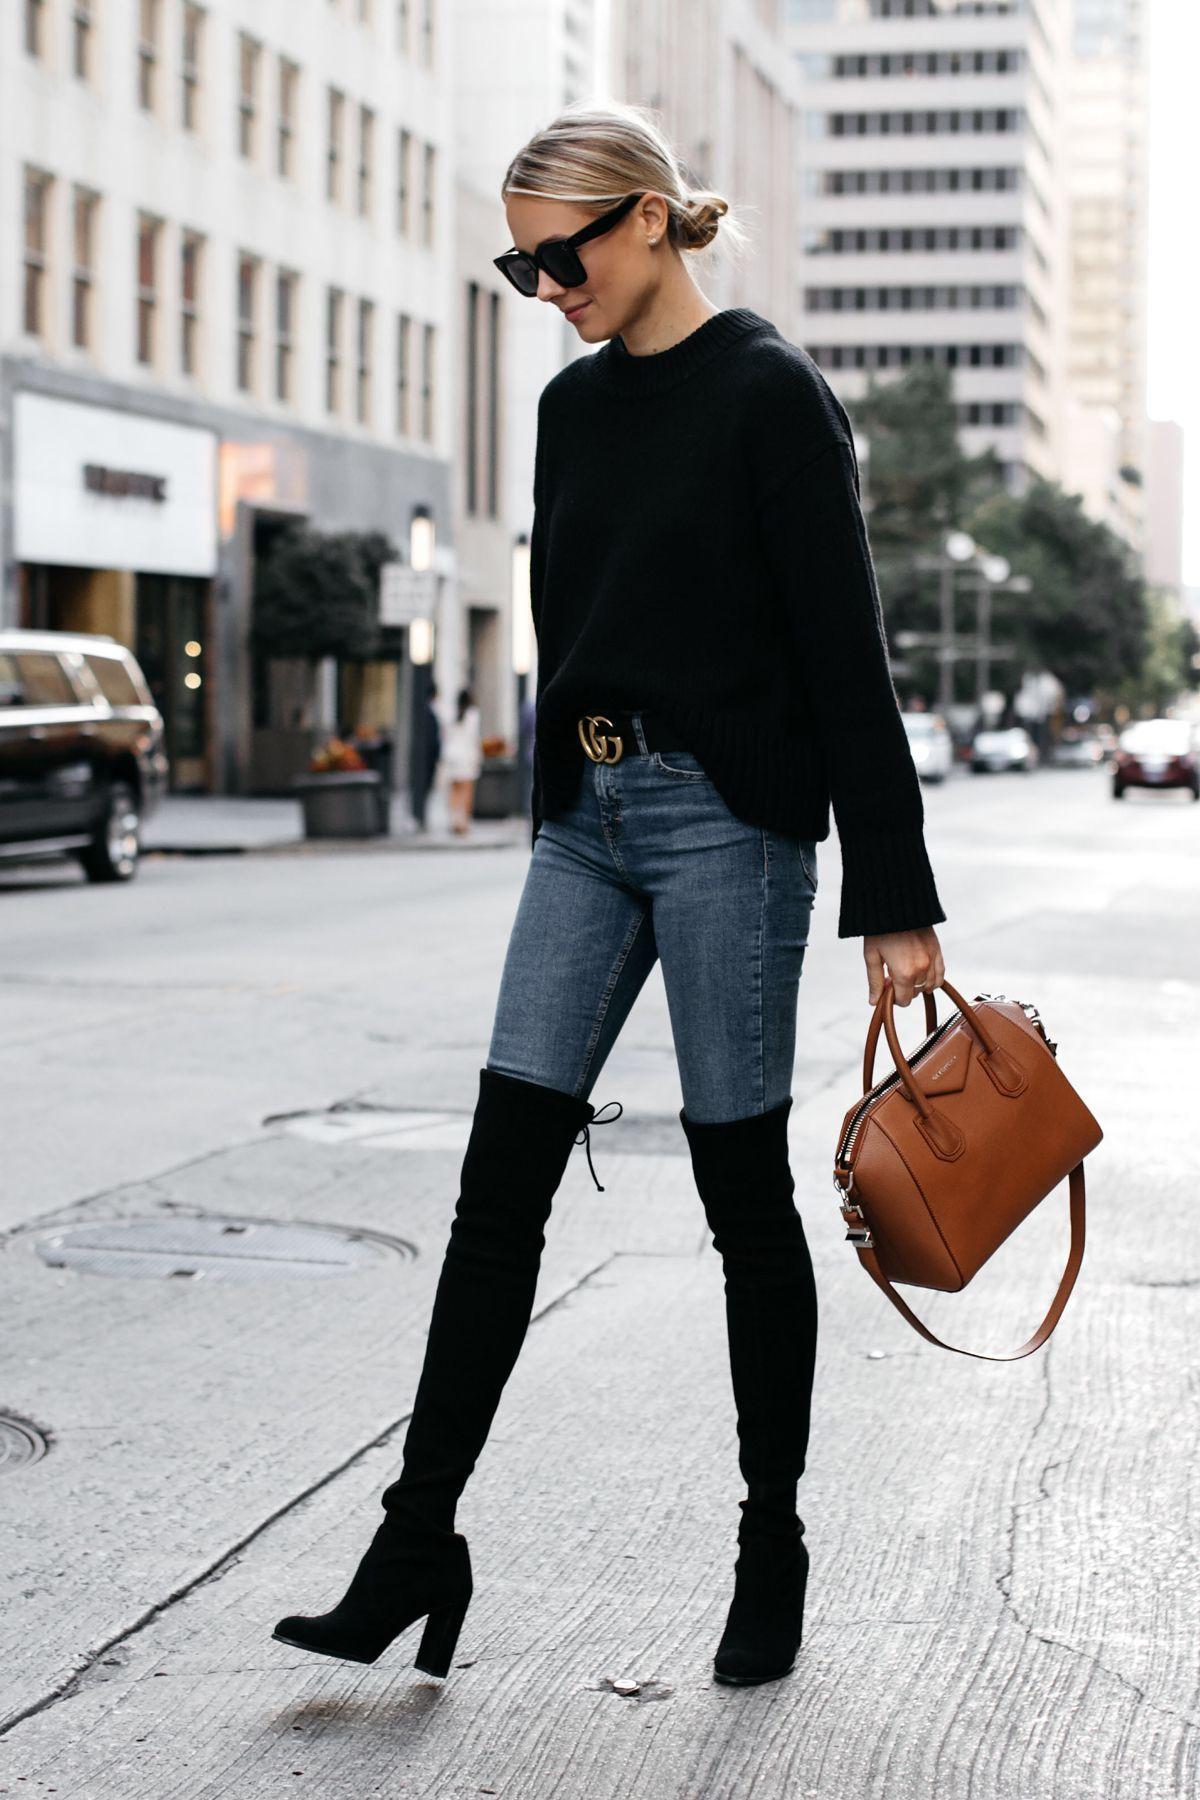 f76900c2bf0 Blonde Woman Wearing Everlane Black Oversized Sweater Denim Skinny Jeans  Gucci Marmont Belt Stuart Weitzman Black Over the Knee Boots Givenchy  Antigona ...